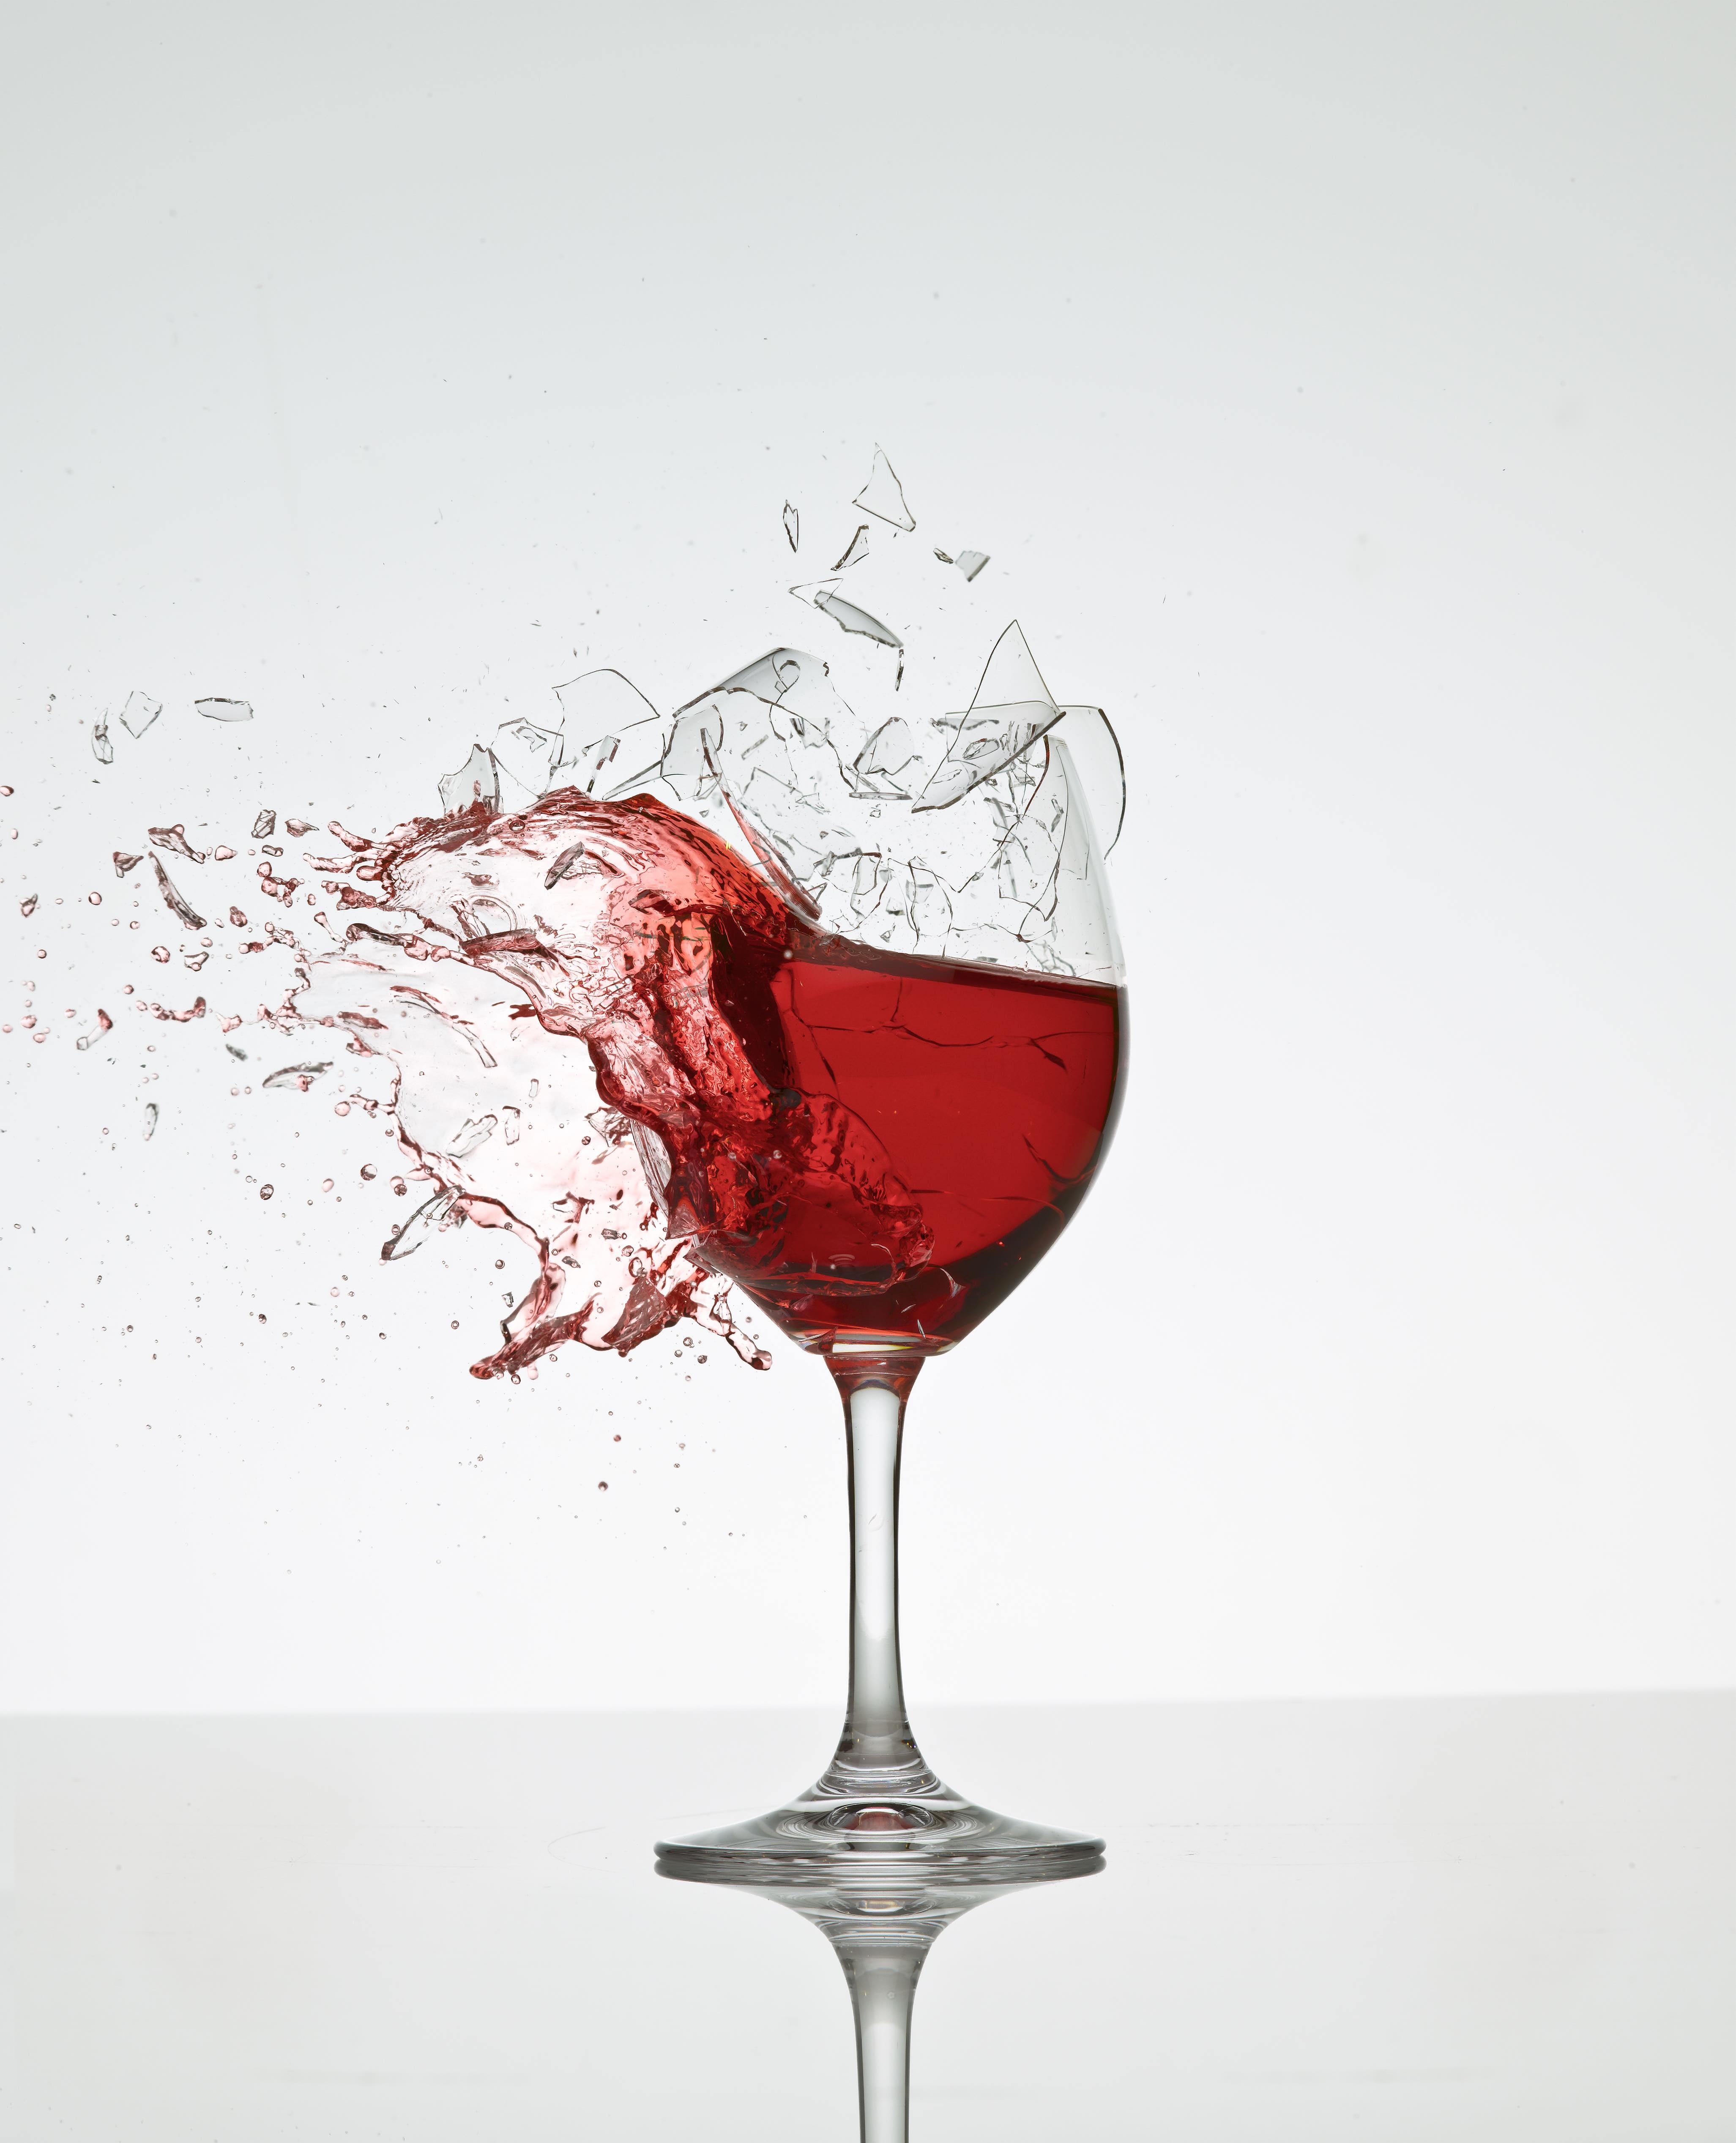 301 moved permanently - Beaker wine glasses ...